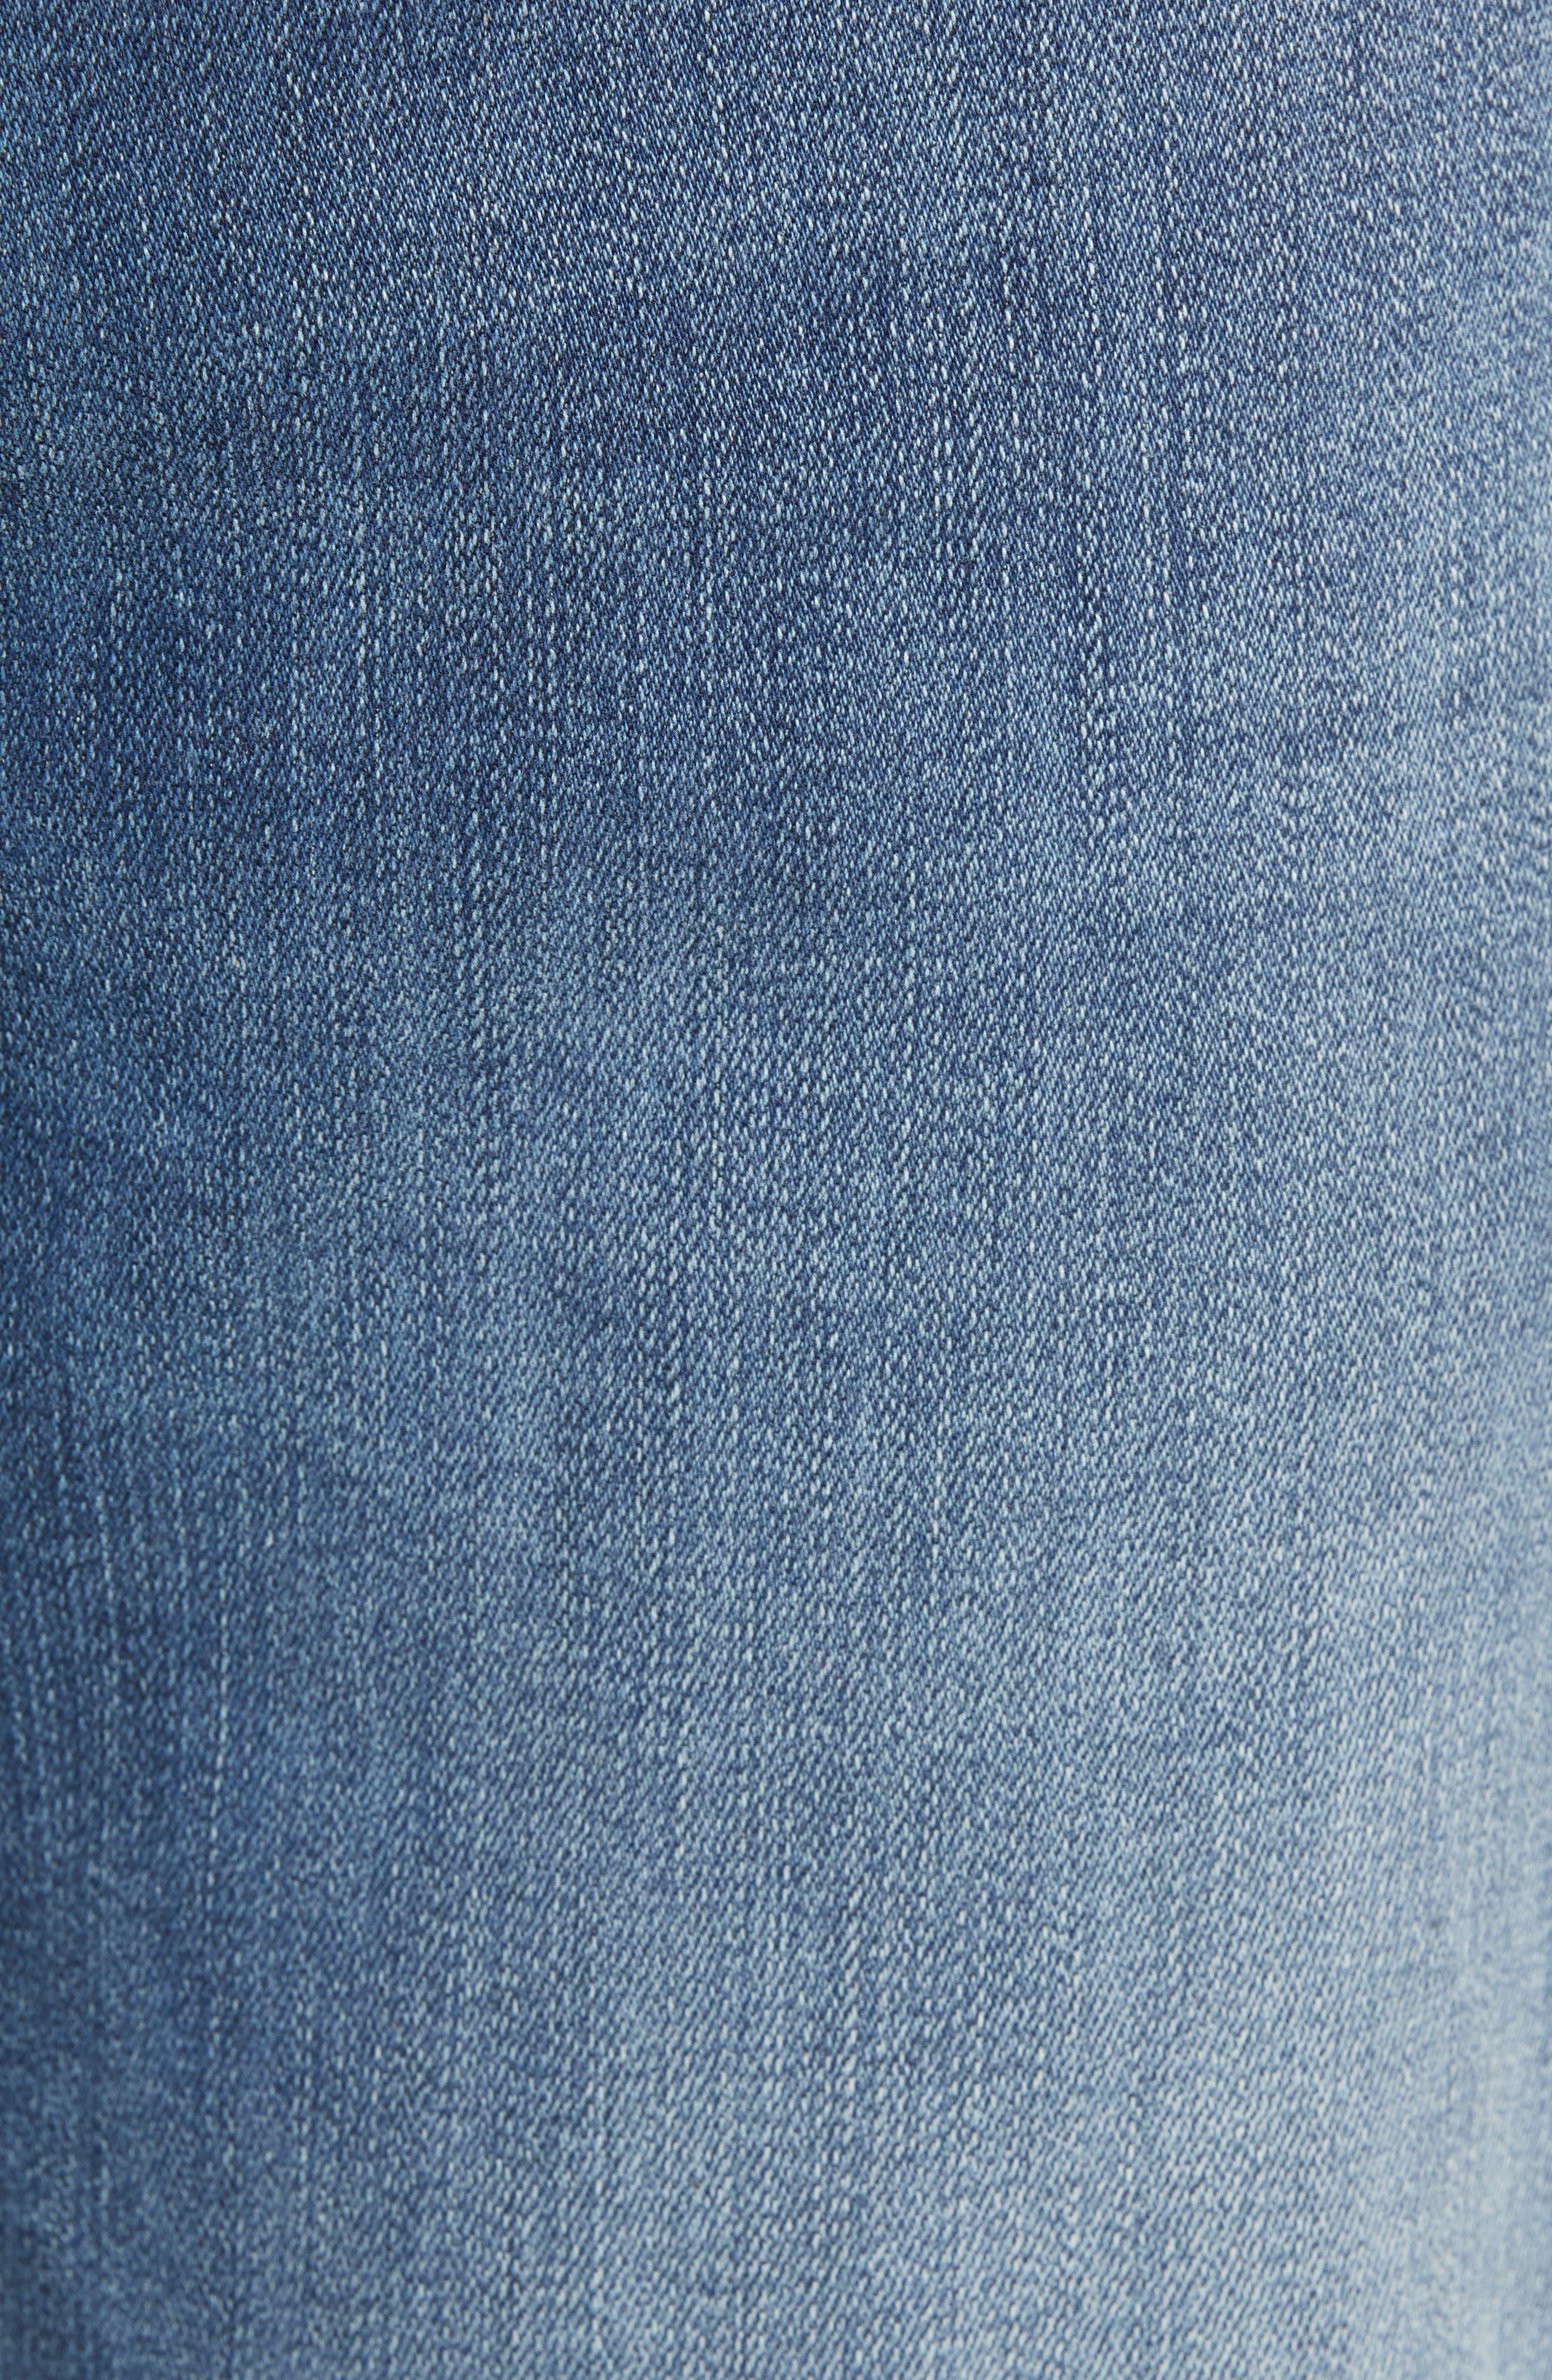 Jimmy Slim Straight Leg Jeans,                             Alternate thumbnail 5, color,                             FOSTER